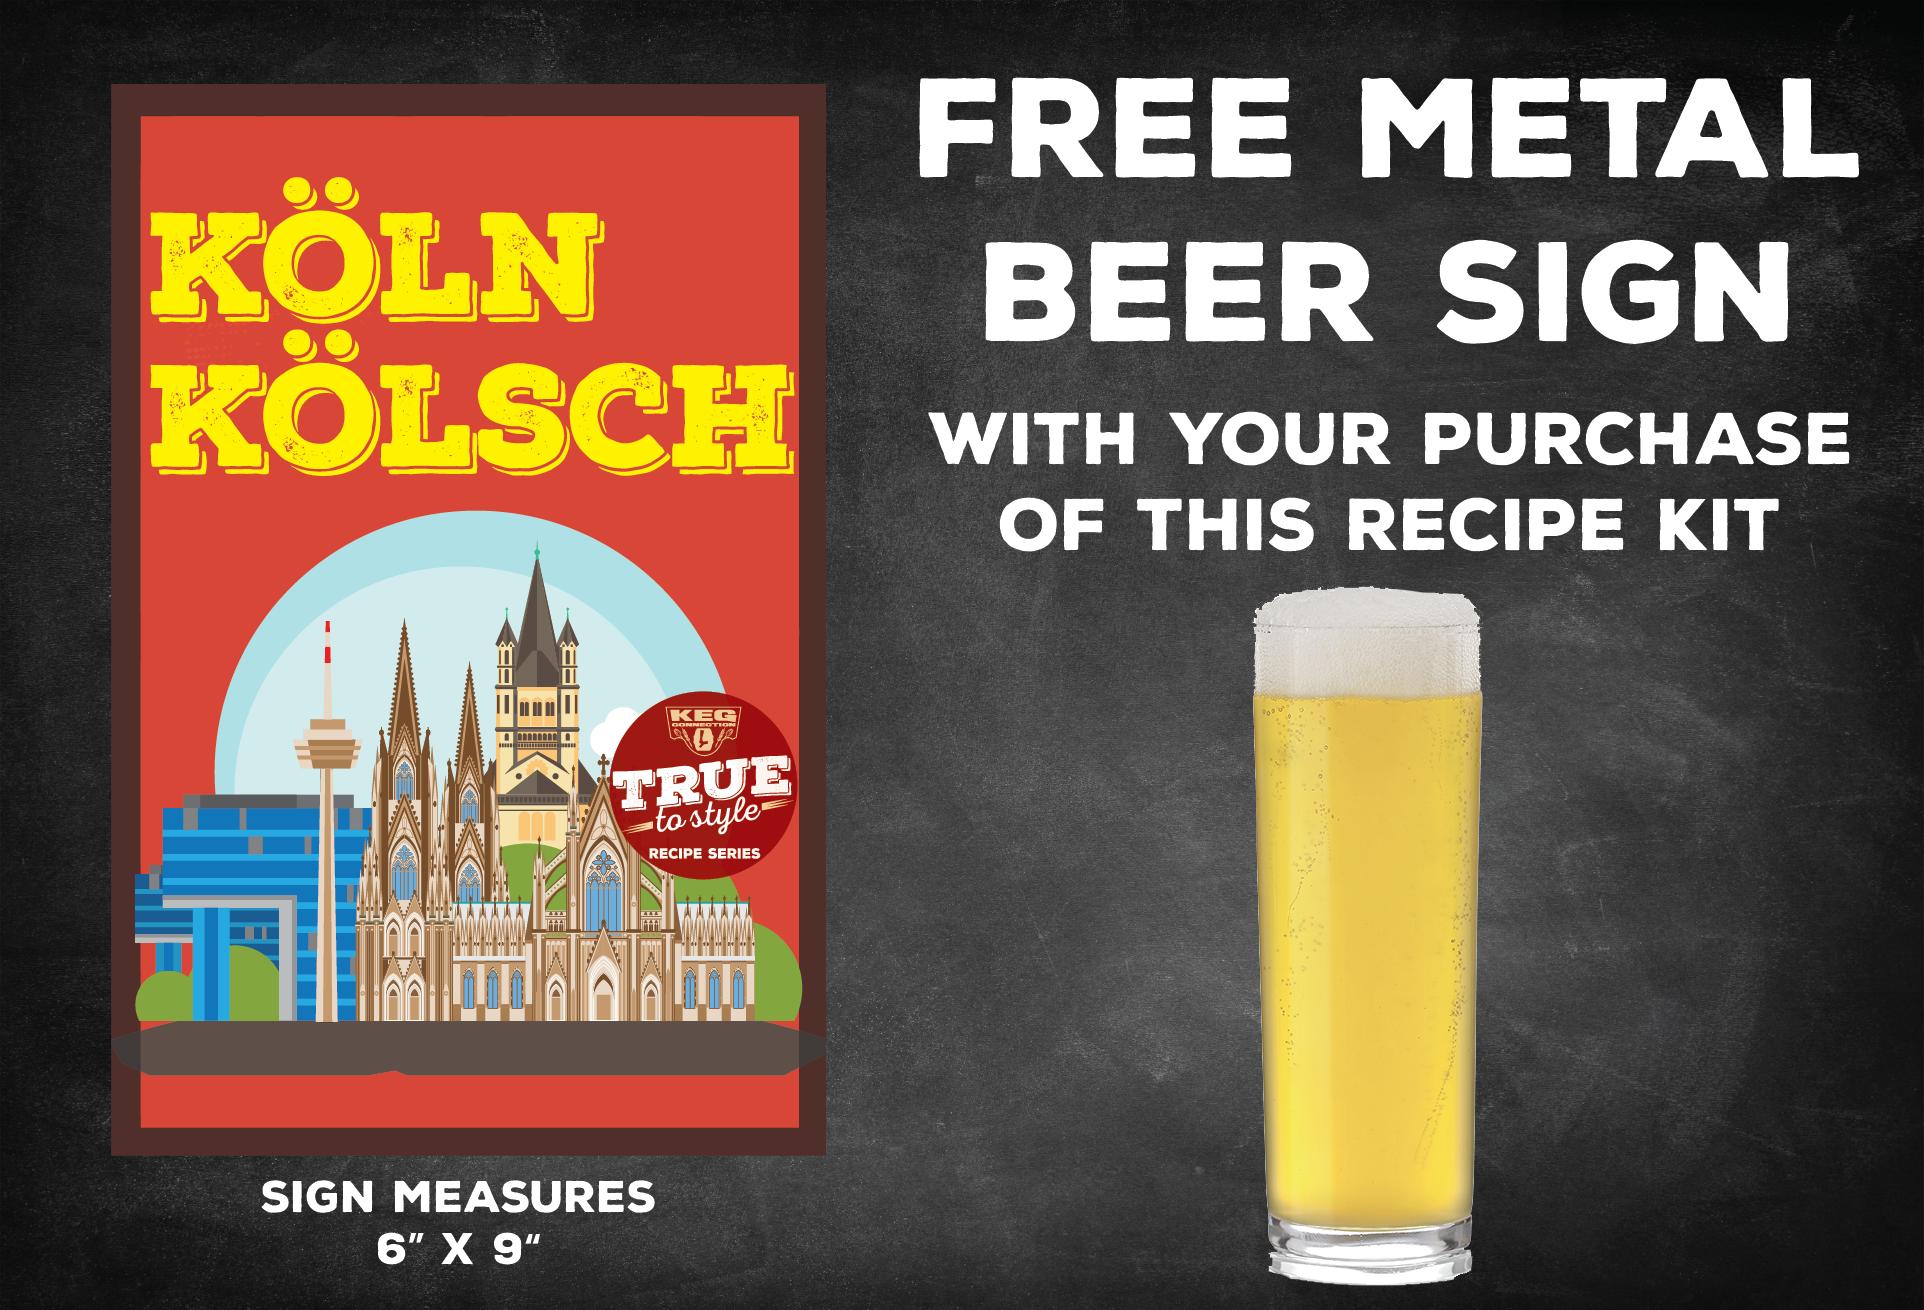 free-metal-sign-kolsch.png